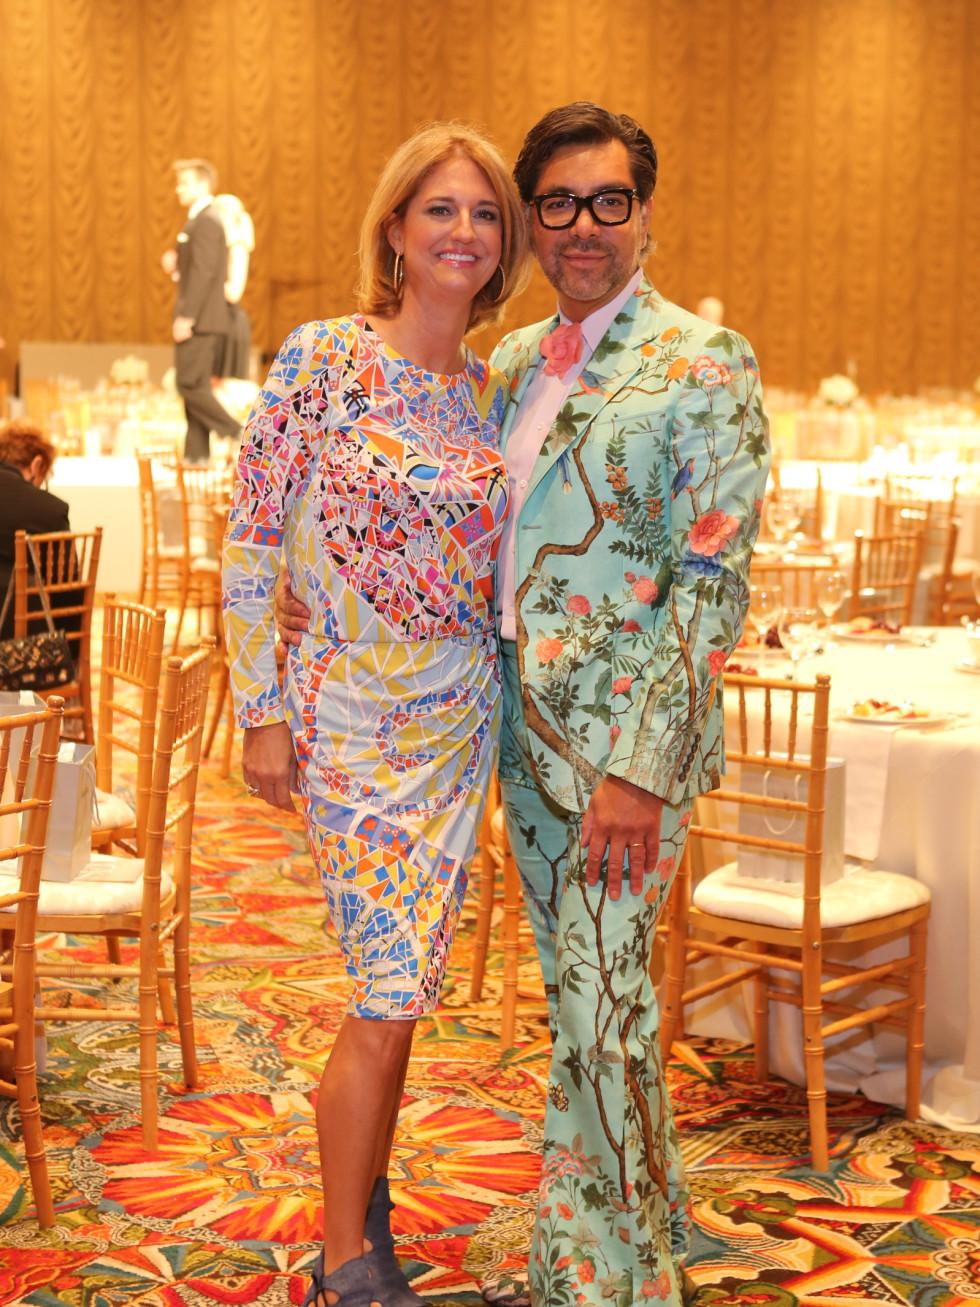 Best Dressed luncheon, March 2016, Liz Zaruba in Pucci, Ceron in Gucci